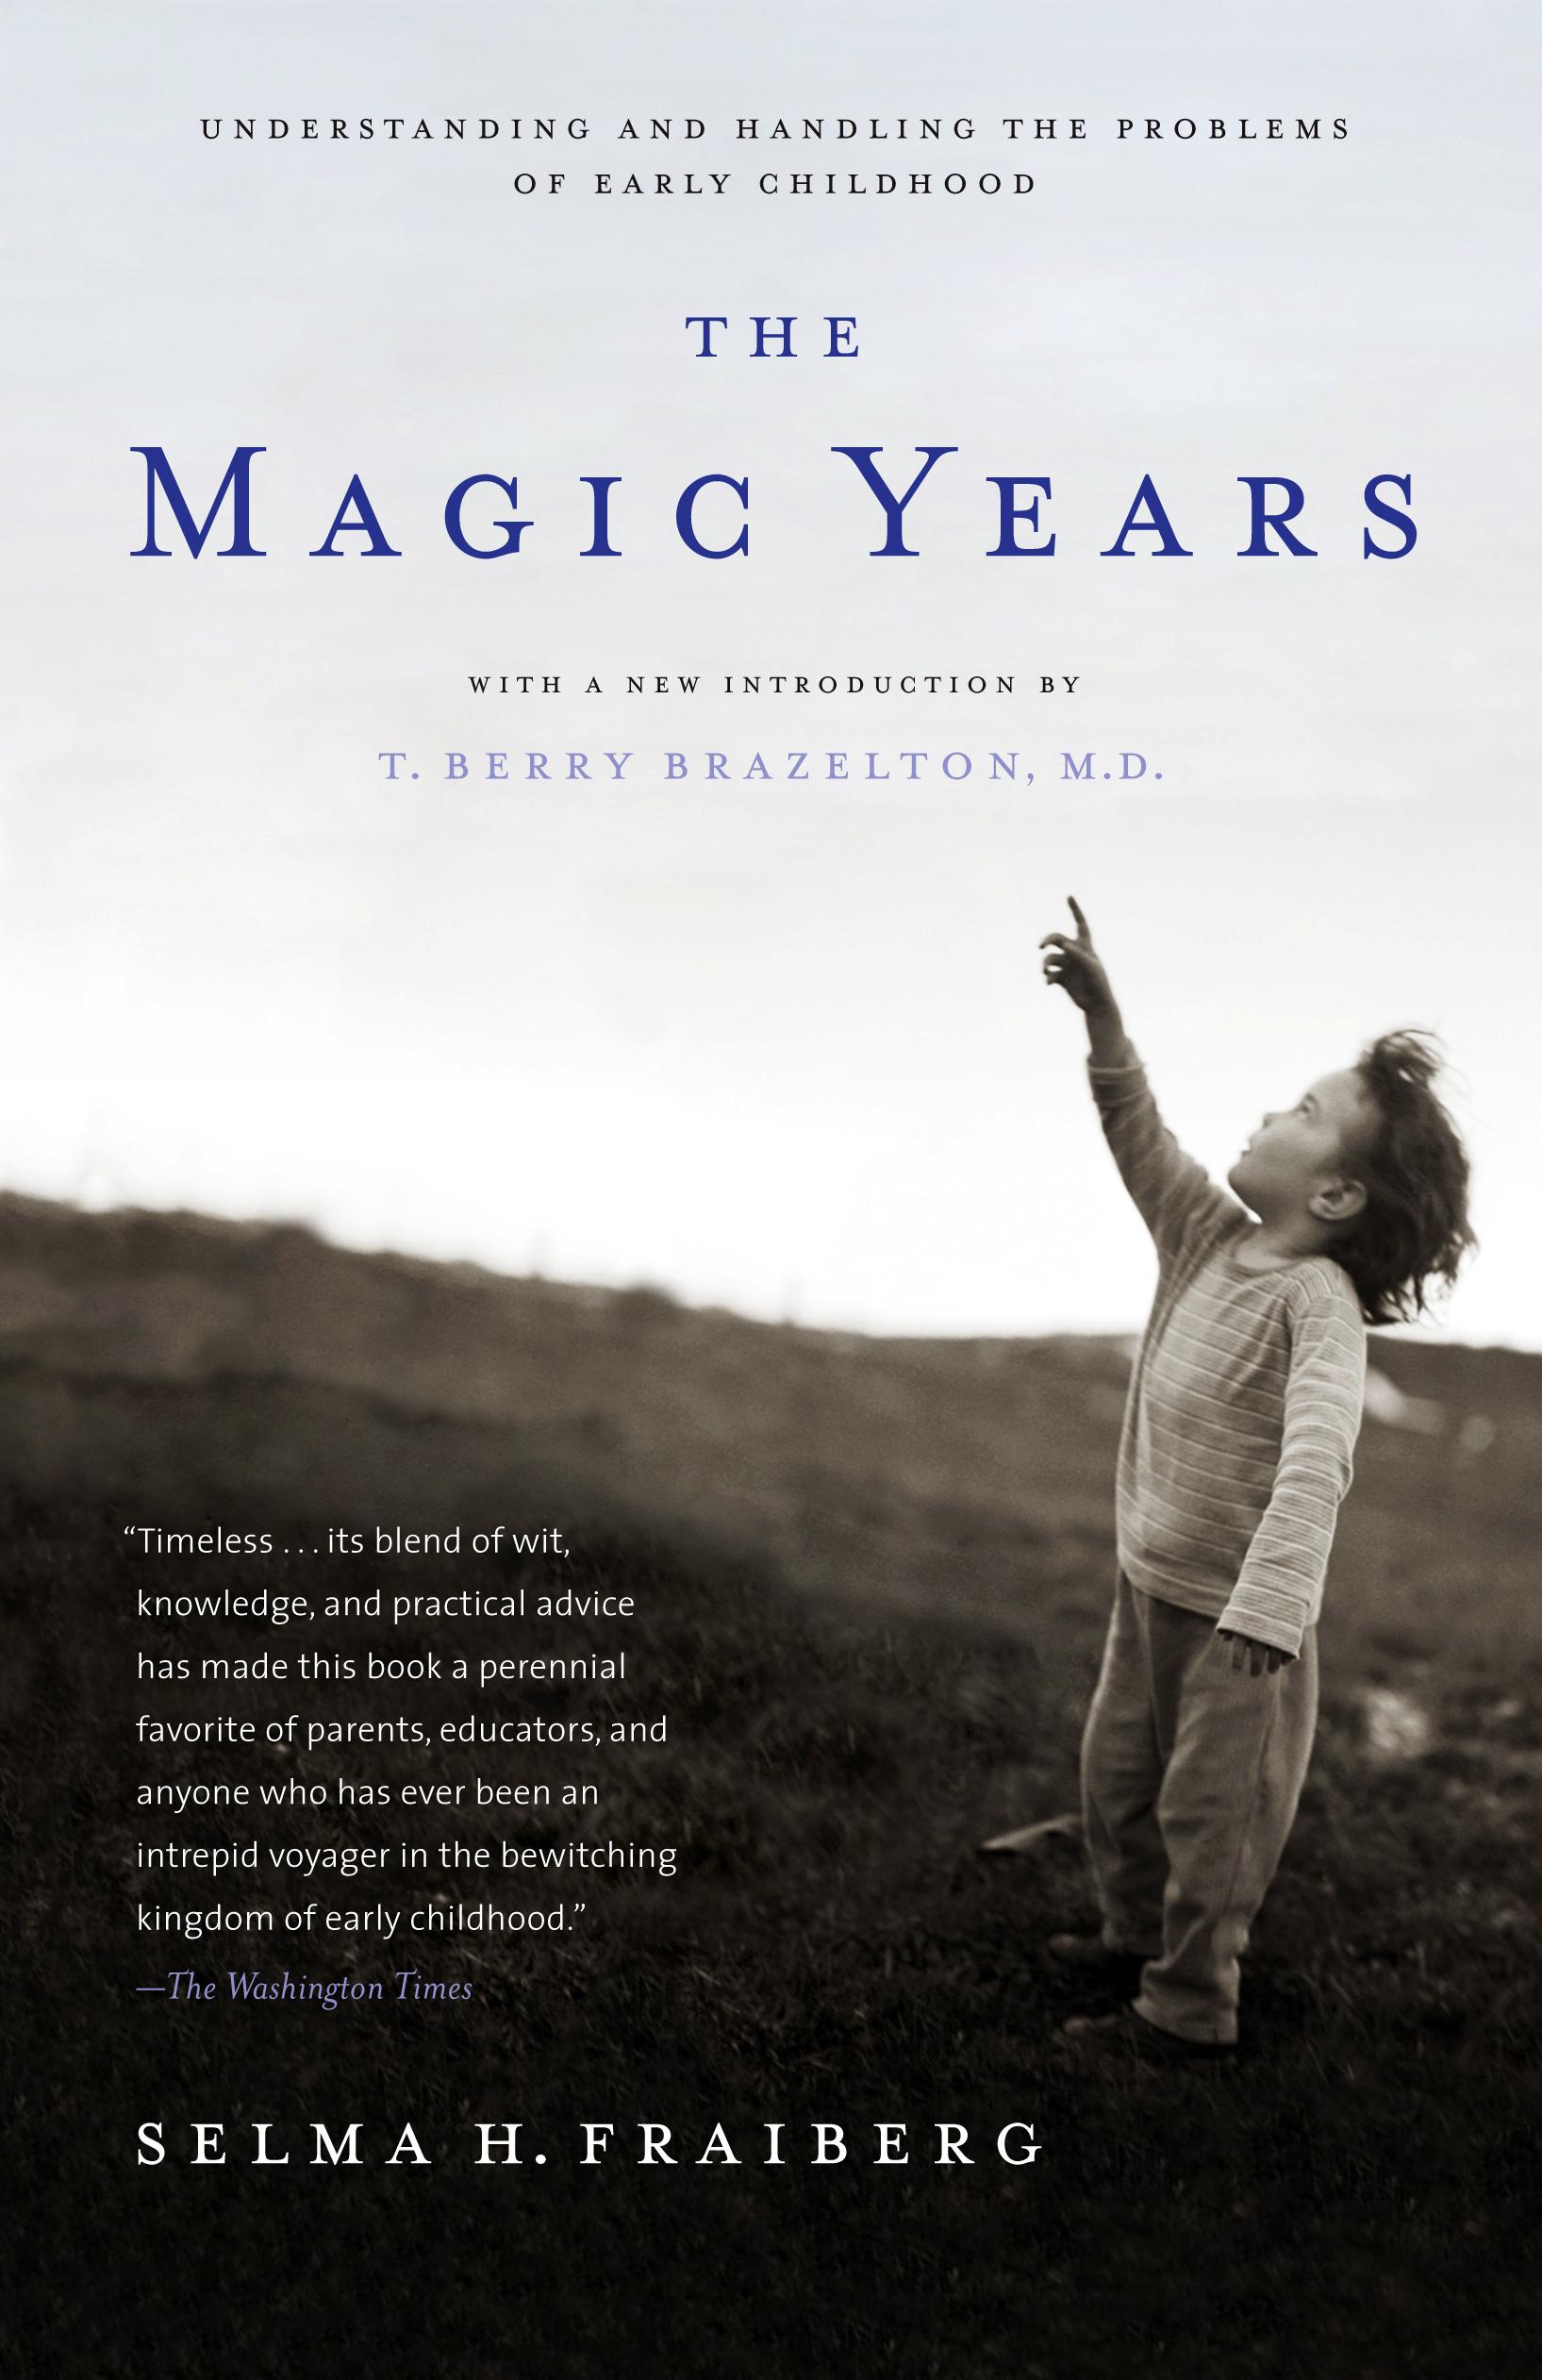 The magic years book by selma h fraiberg t berry brazelton cvr9780684825502 9780684825502 hr fandeluxe Gallery